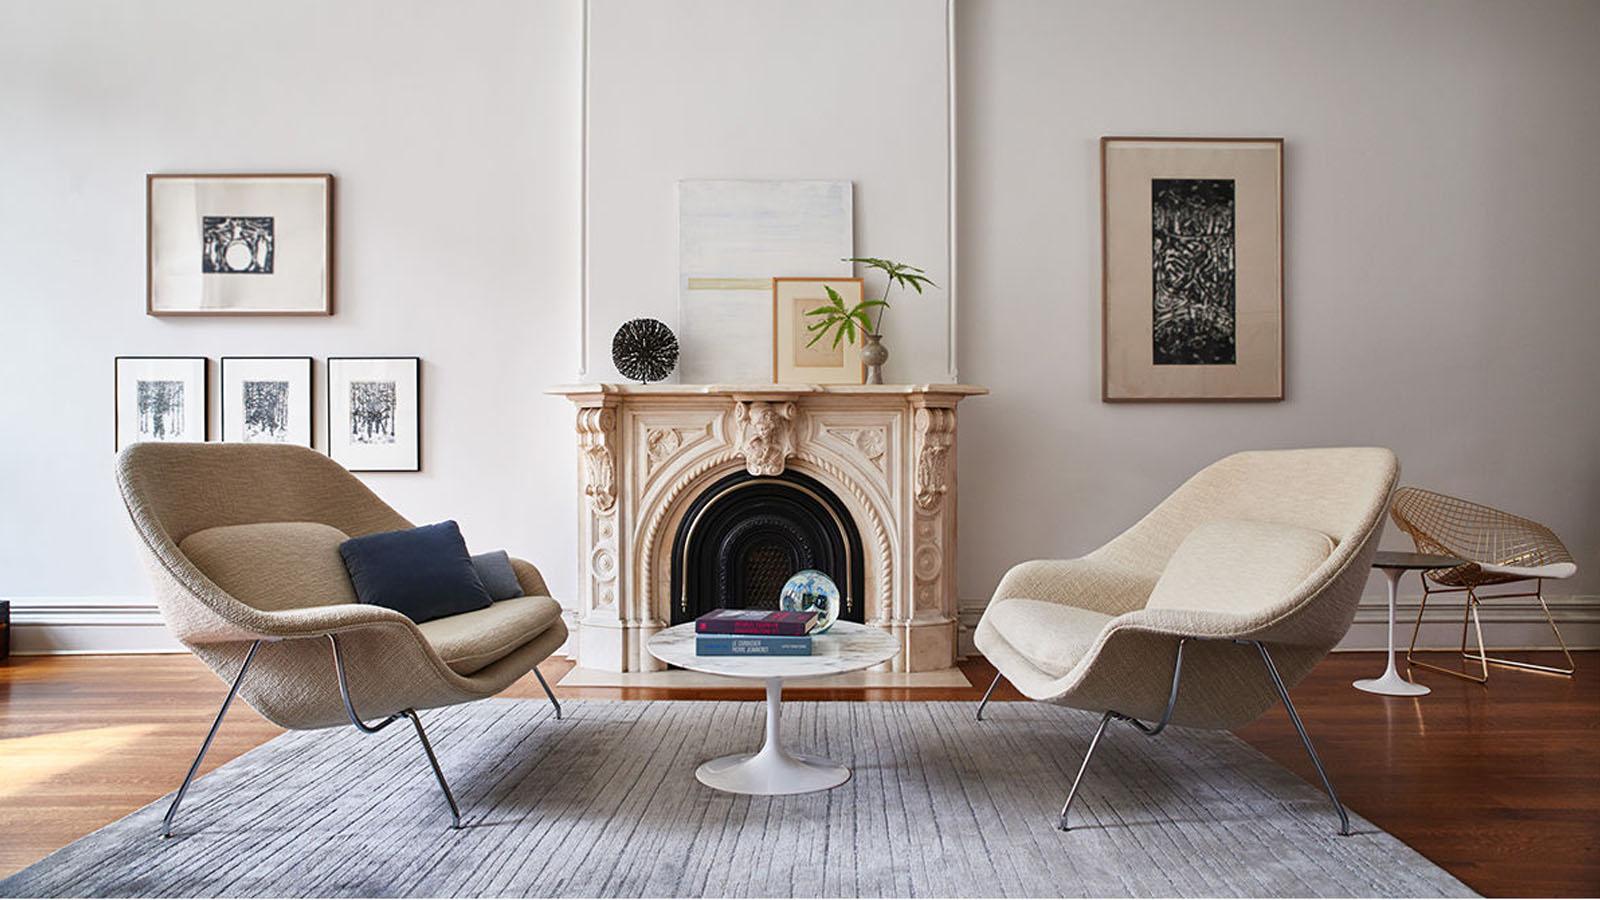 Tavolo Tulip Eero Saarinen : Eero saarinen s tulip chair and designs sag